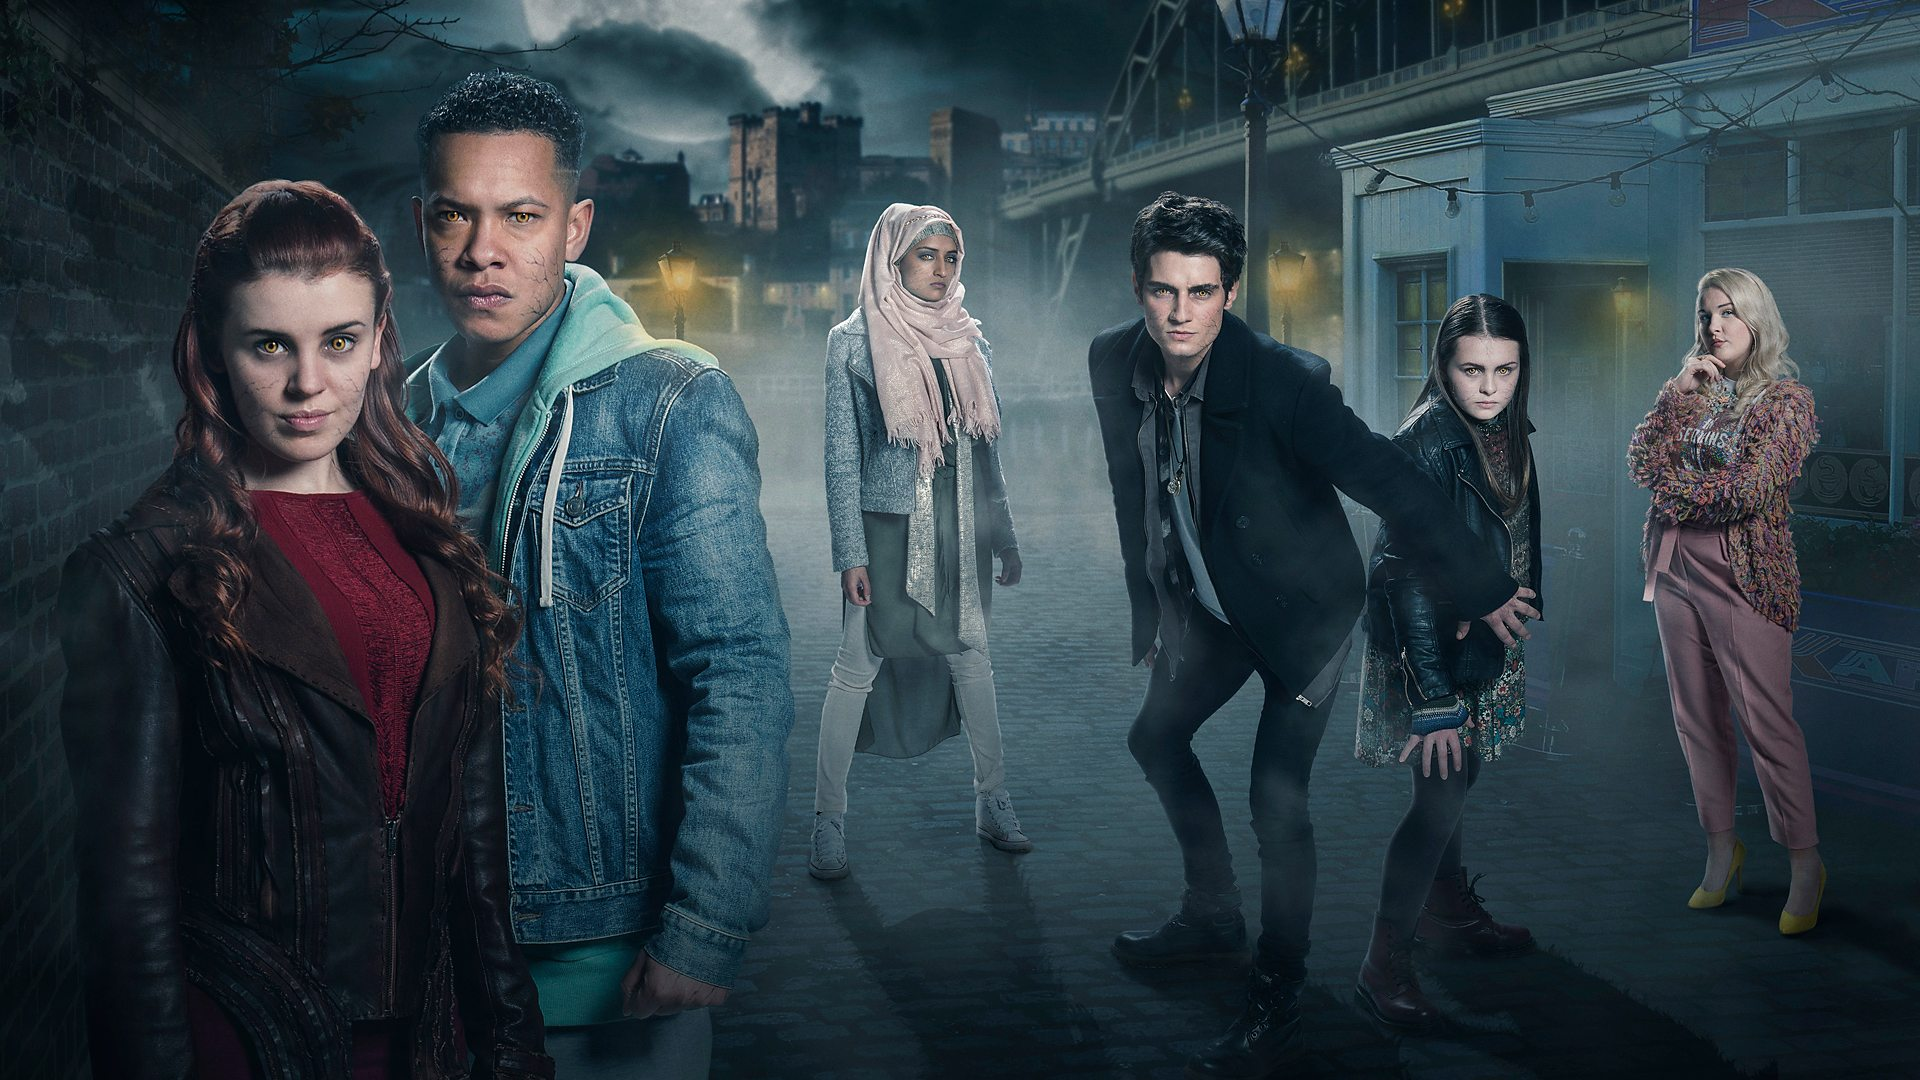 Wolfblood episodes (TV Series 2012 - 2017)